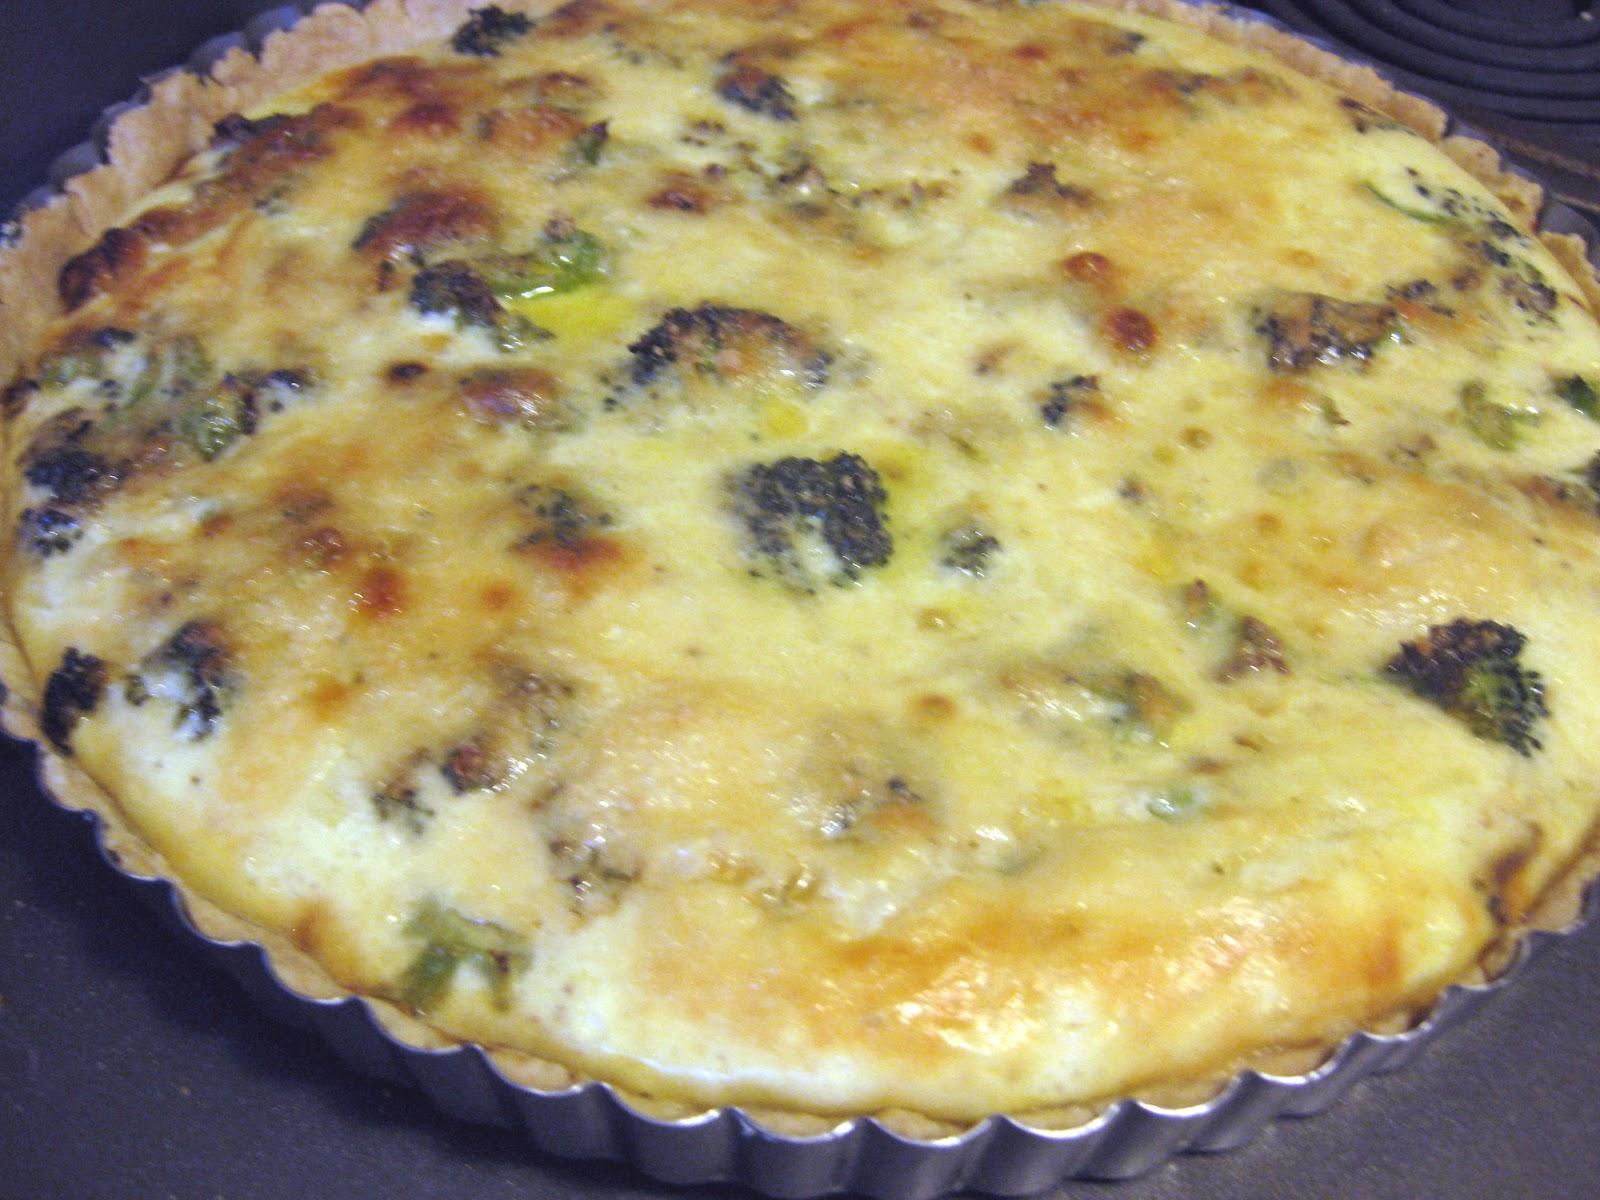 FEST: Caramelized Onion Gruyere Quiche